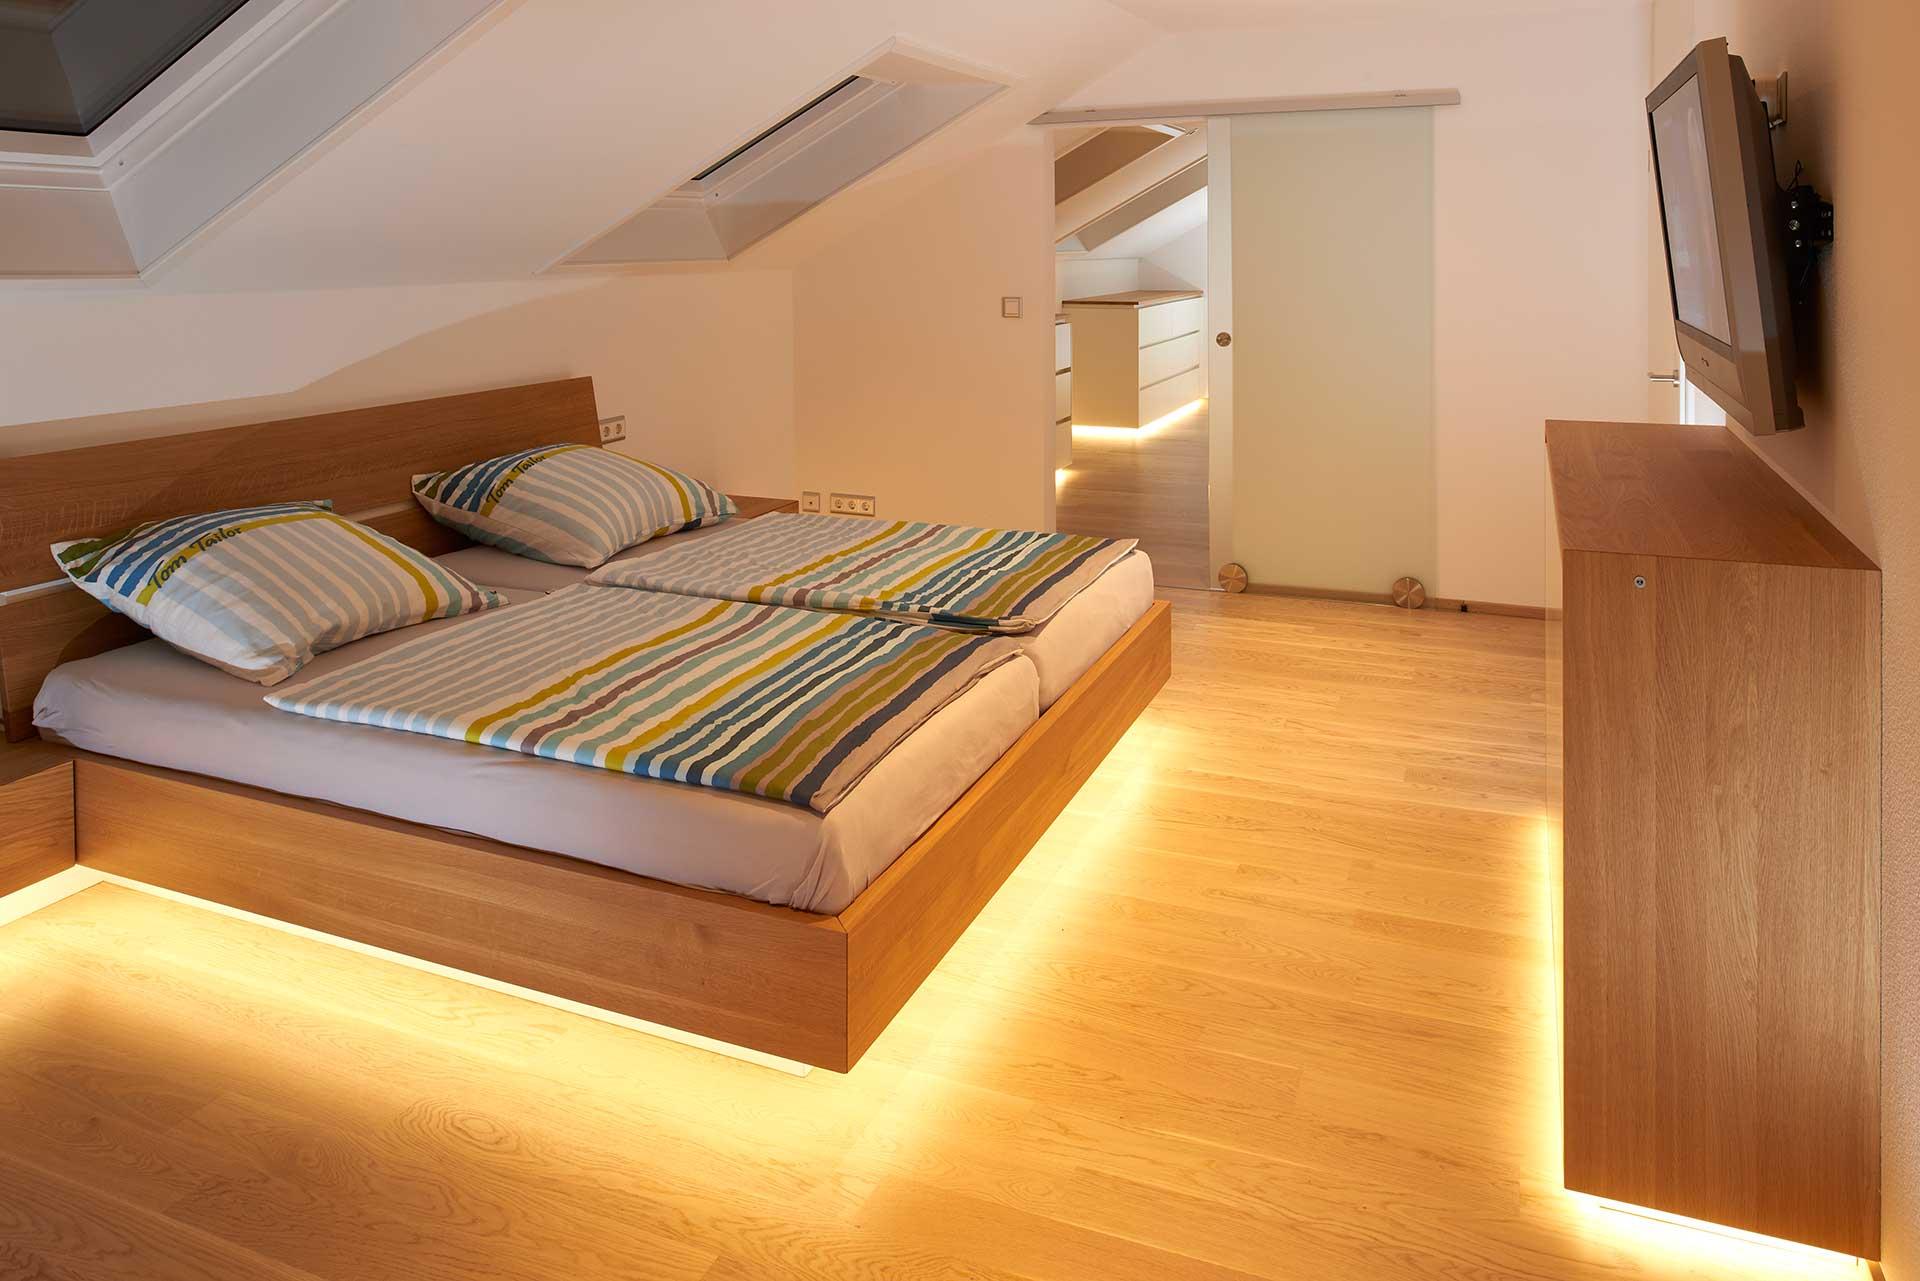 Indirekte Led Beleuchtung Schlafzimmer – Caseconrad.com